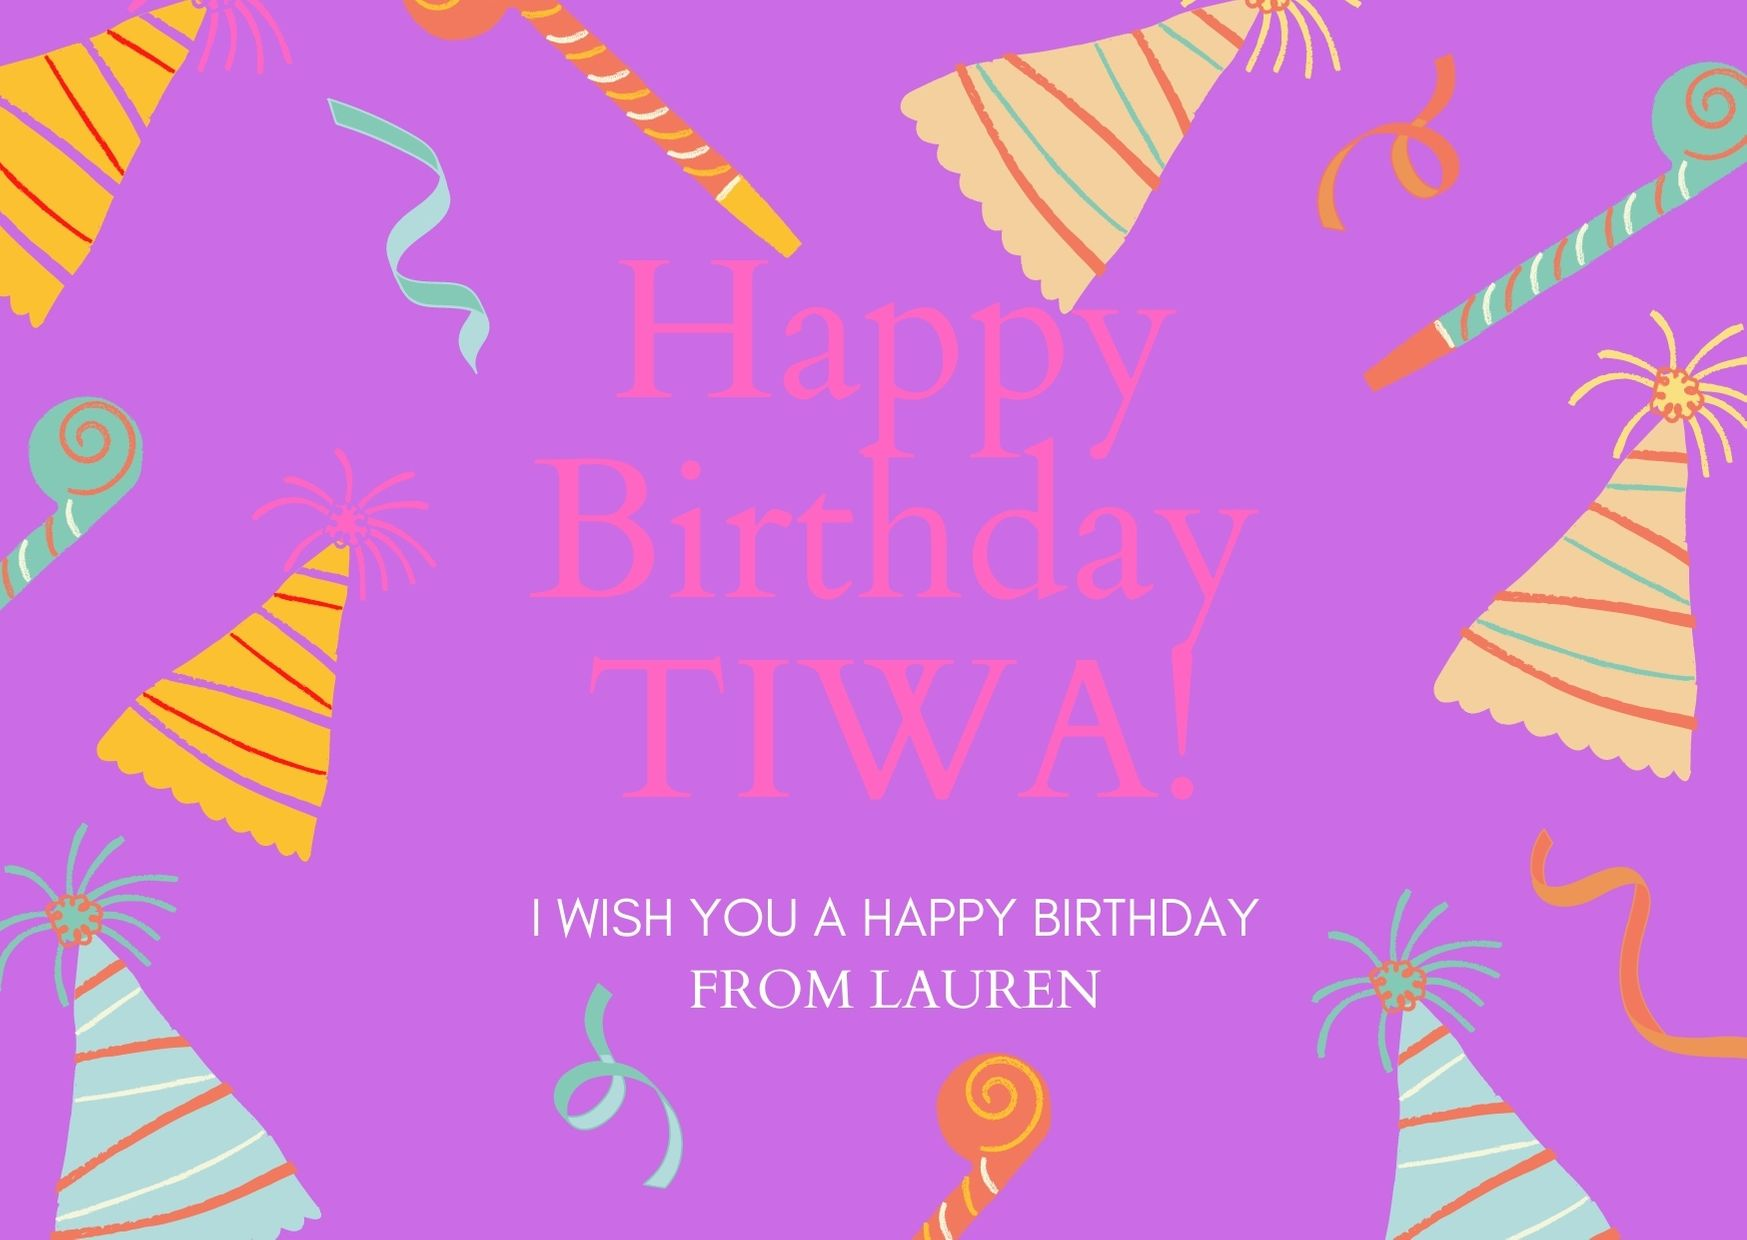 https://edustemlab.com/wp-content/uploads/2021/03/I-wish-you-a-happy-birthday.jpg